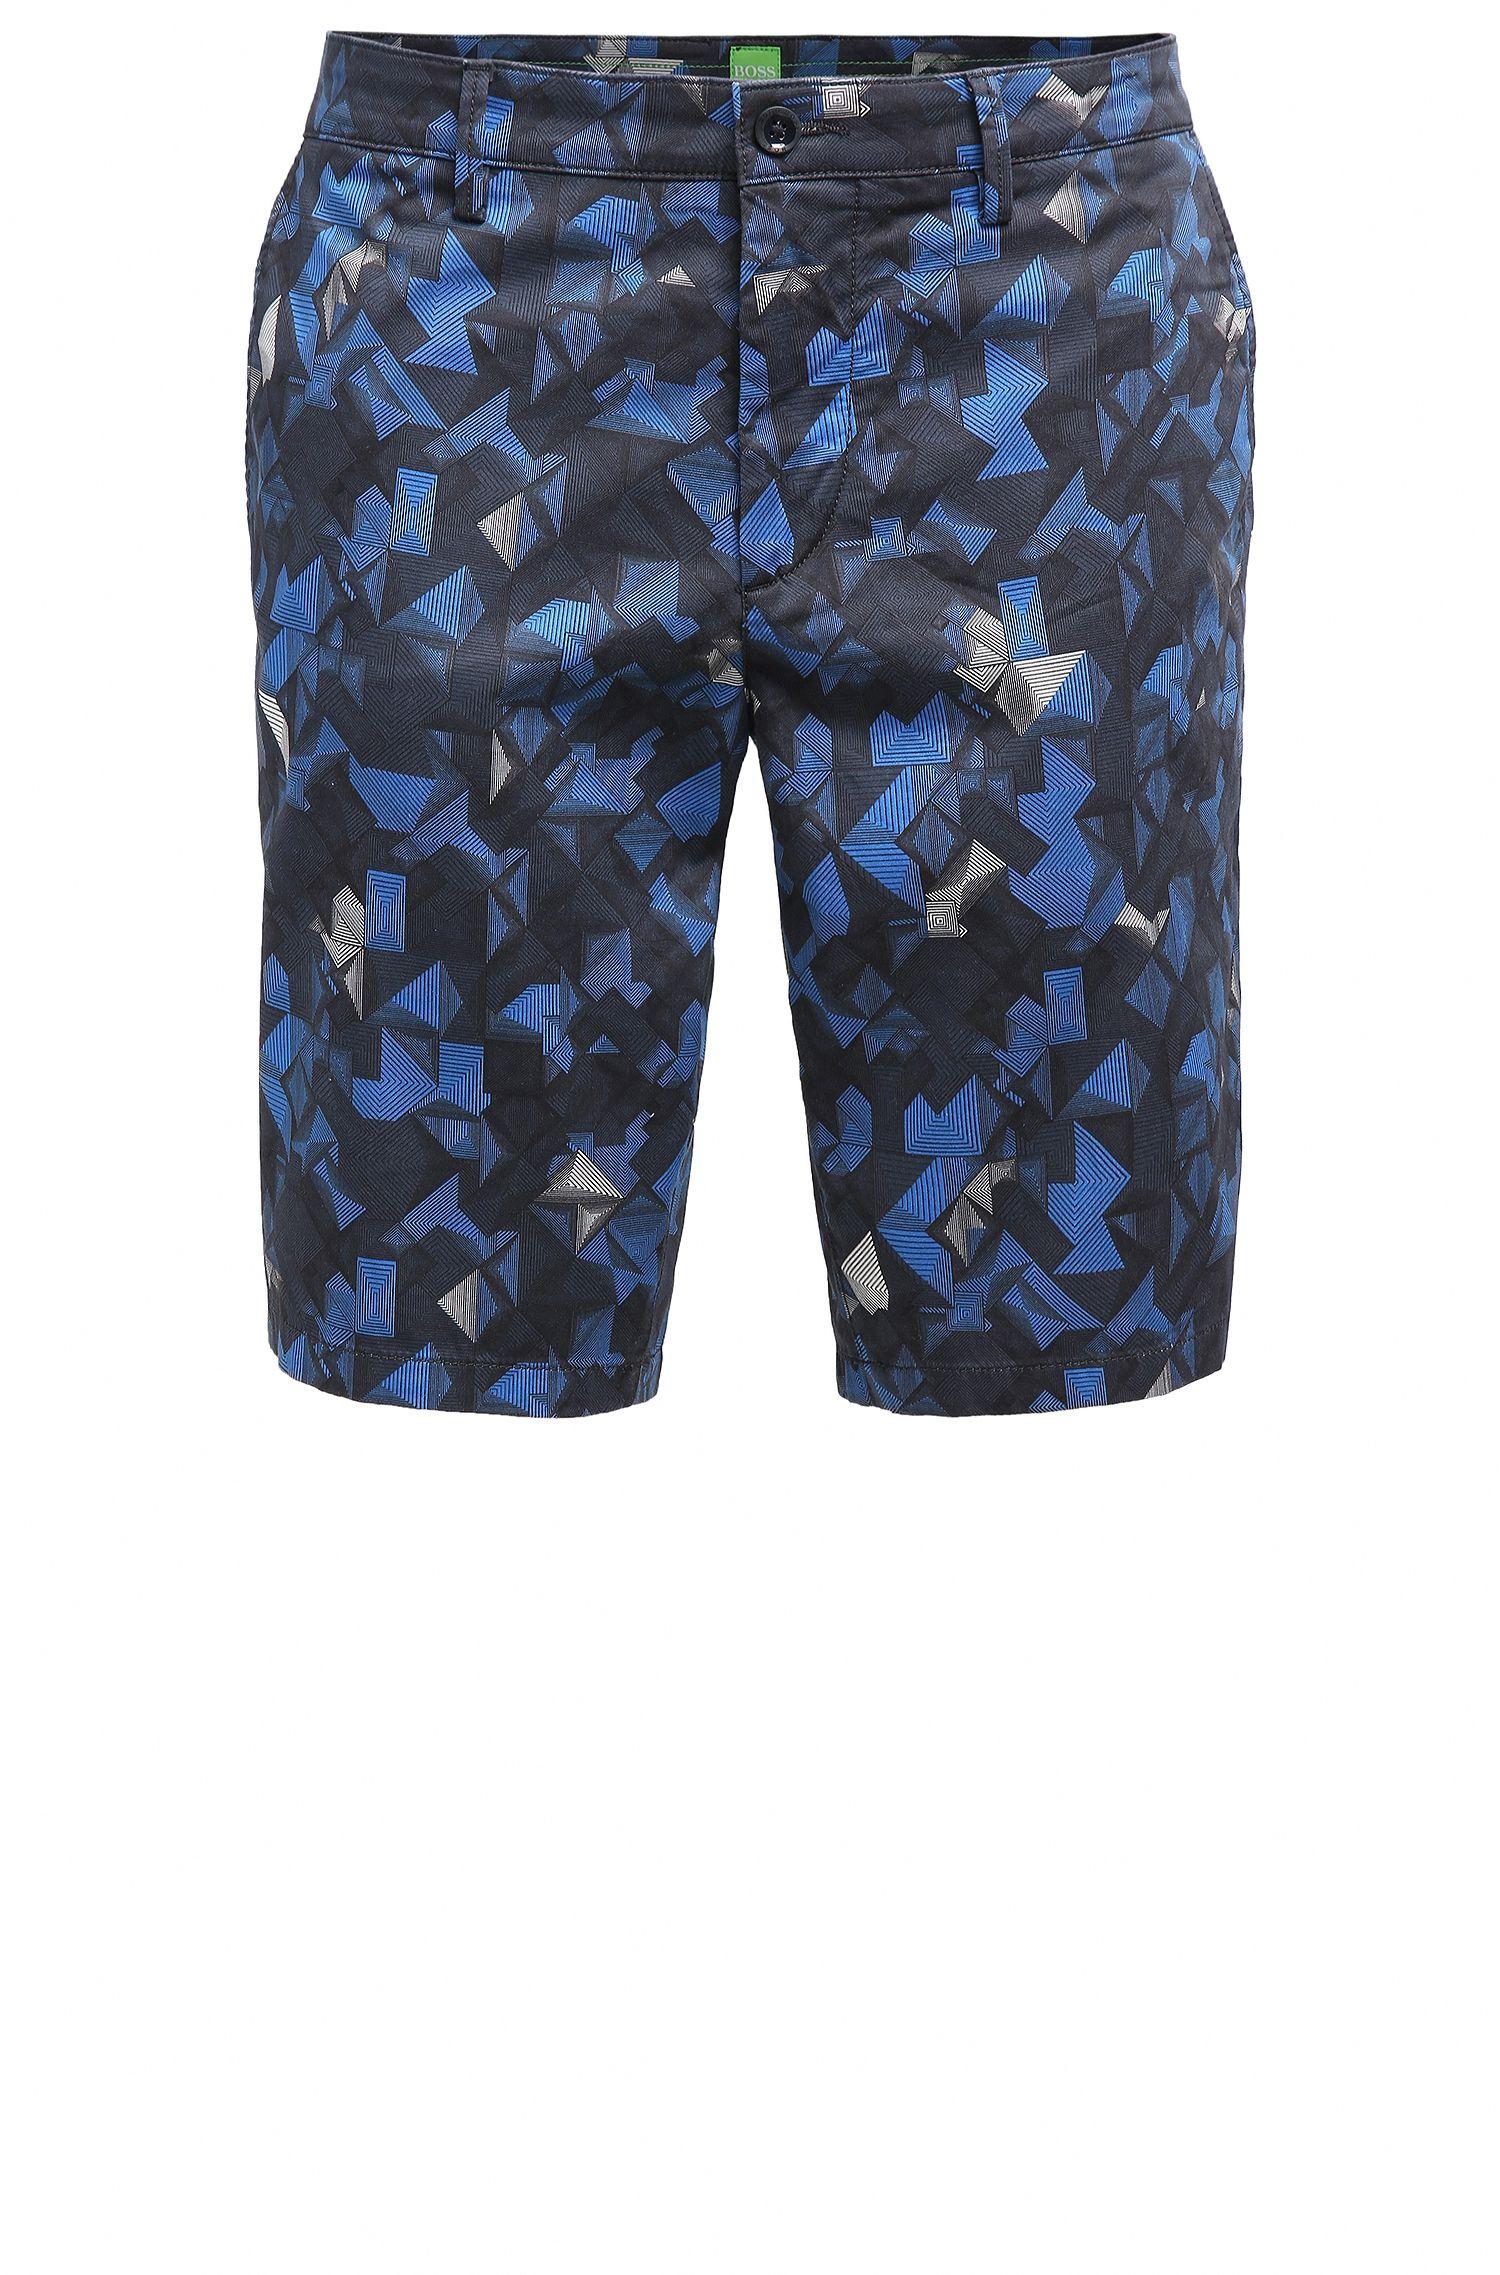 Printed Sateen Stretch Cotton Short, Slim Fit | Liem Print W